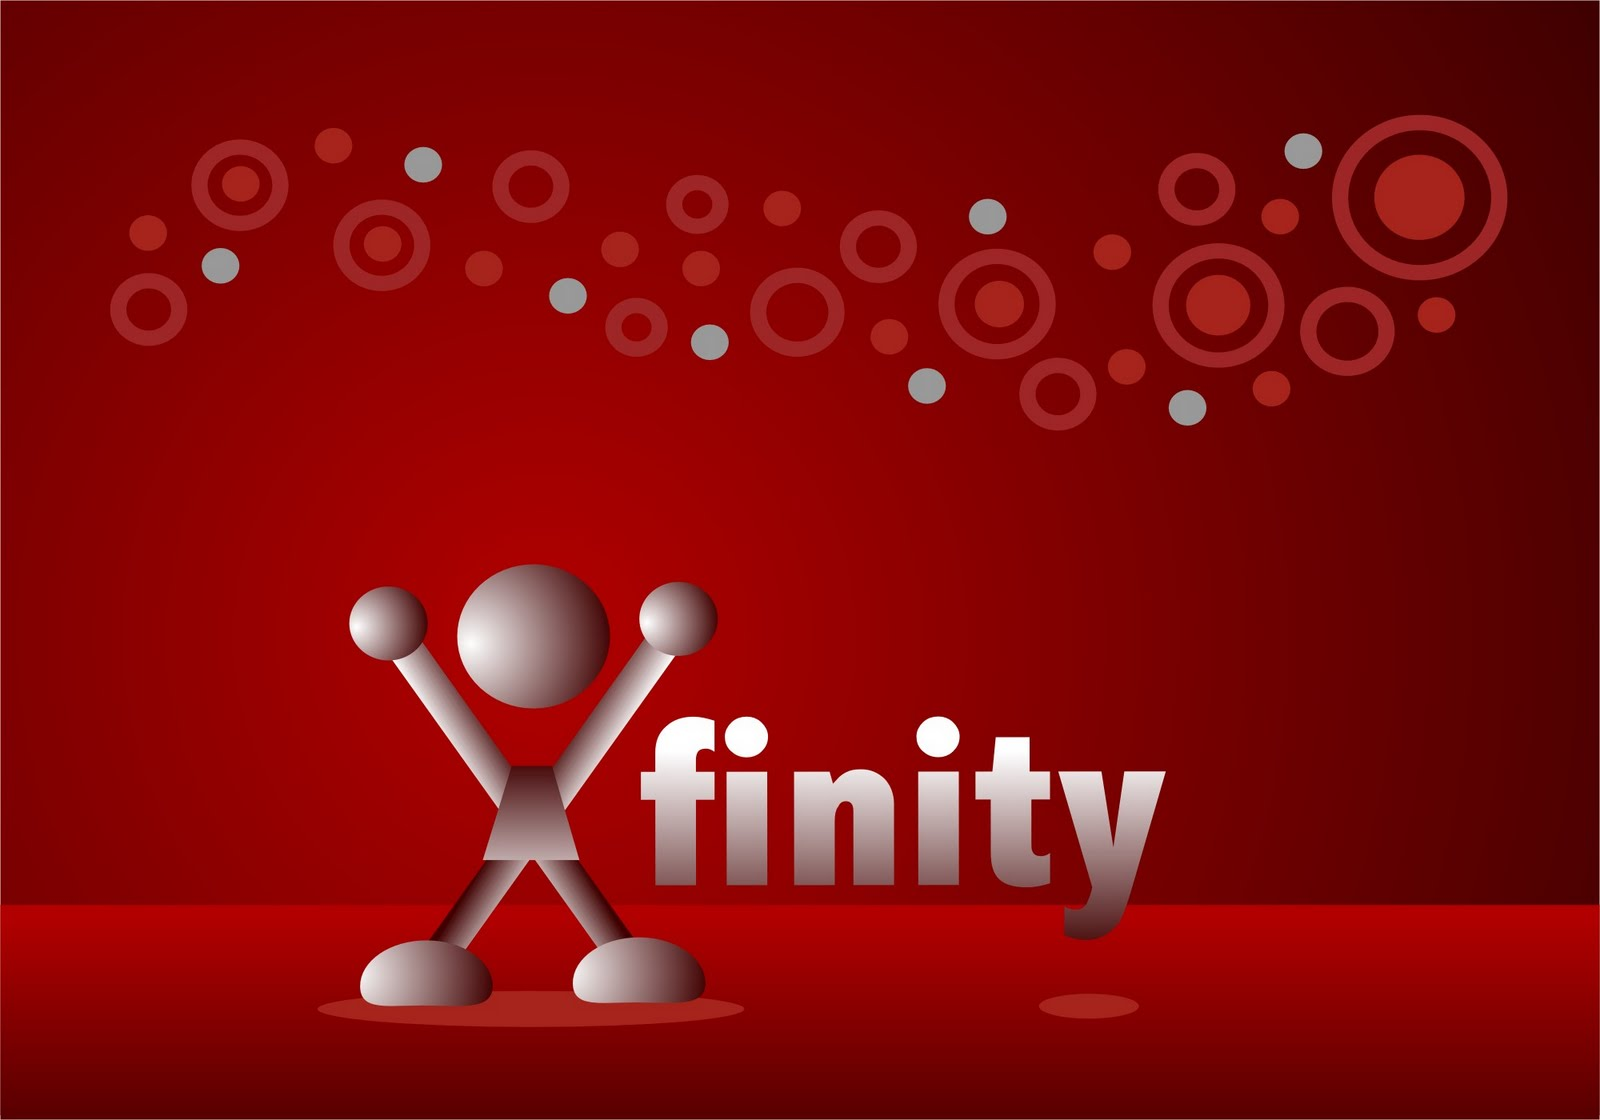 download Xfinity X Cartoon Background 2 [1600x1120] for your 1600x1120